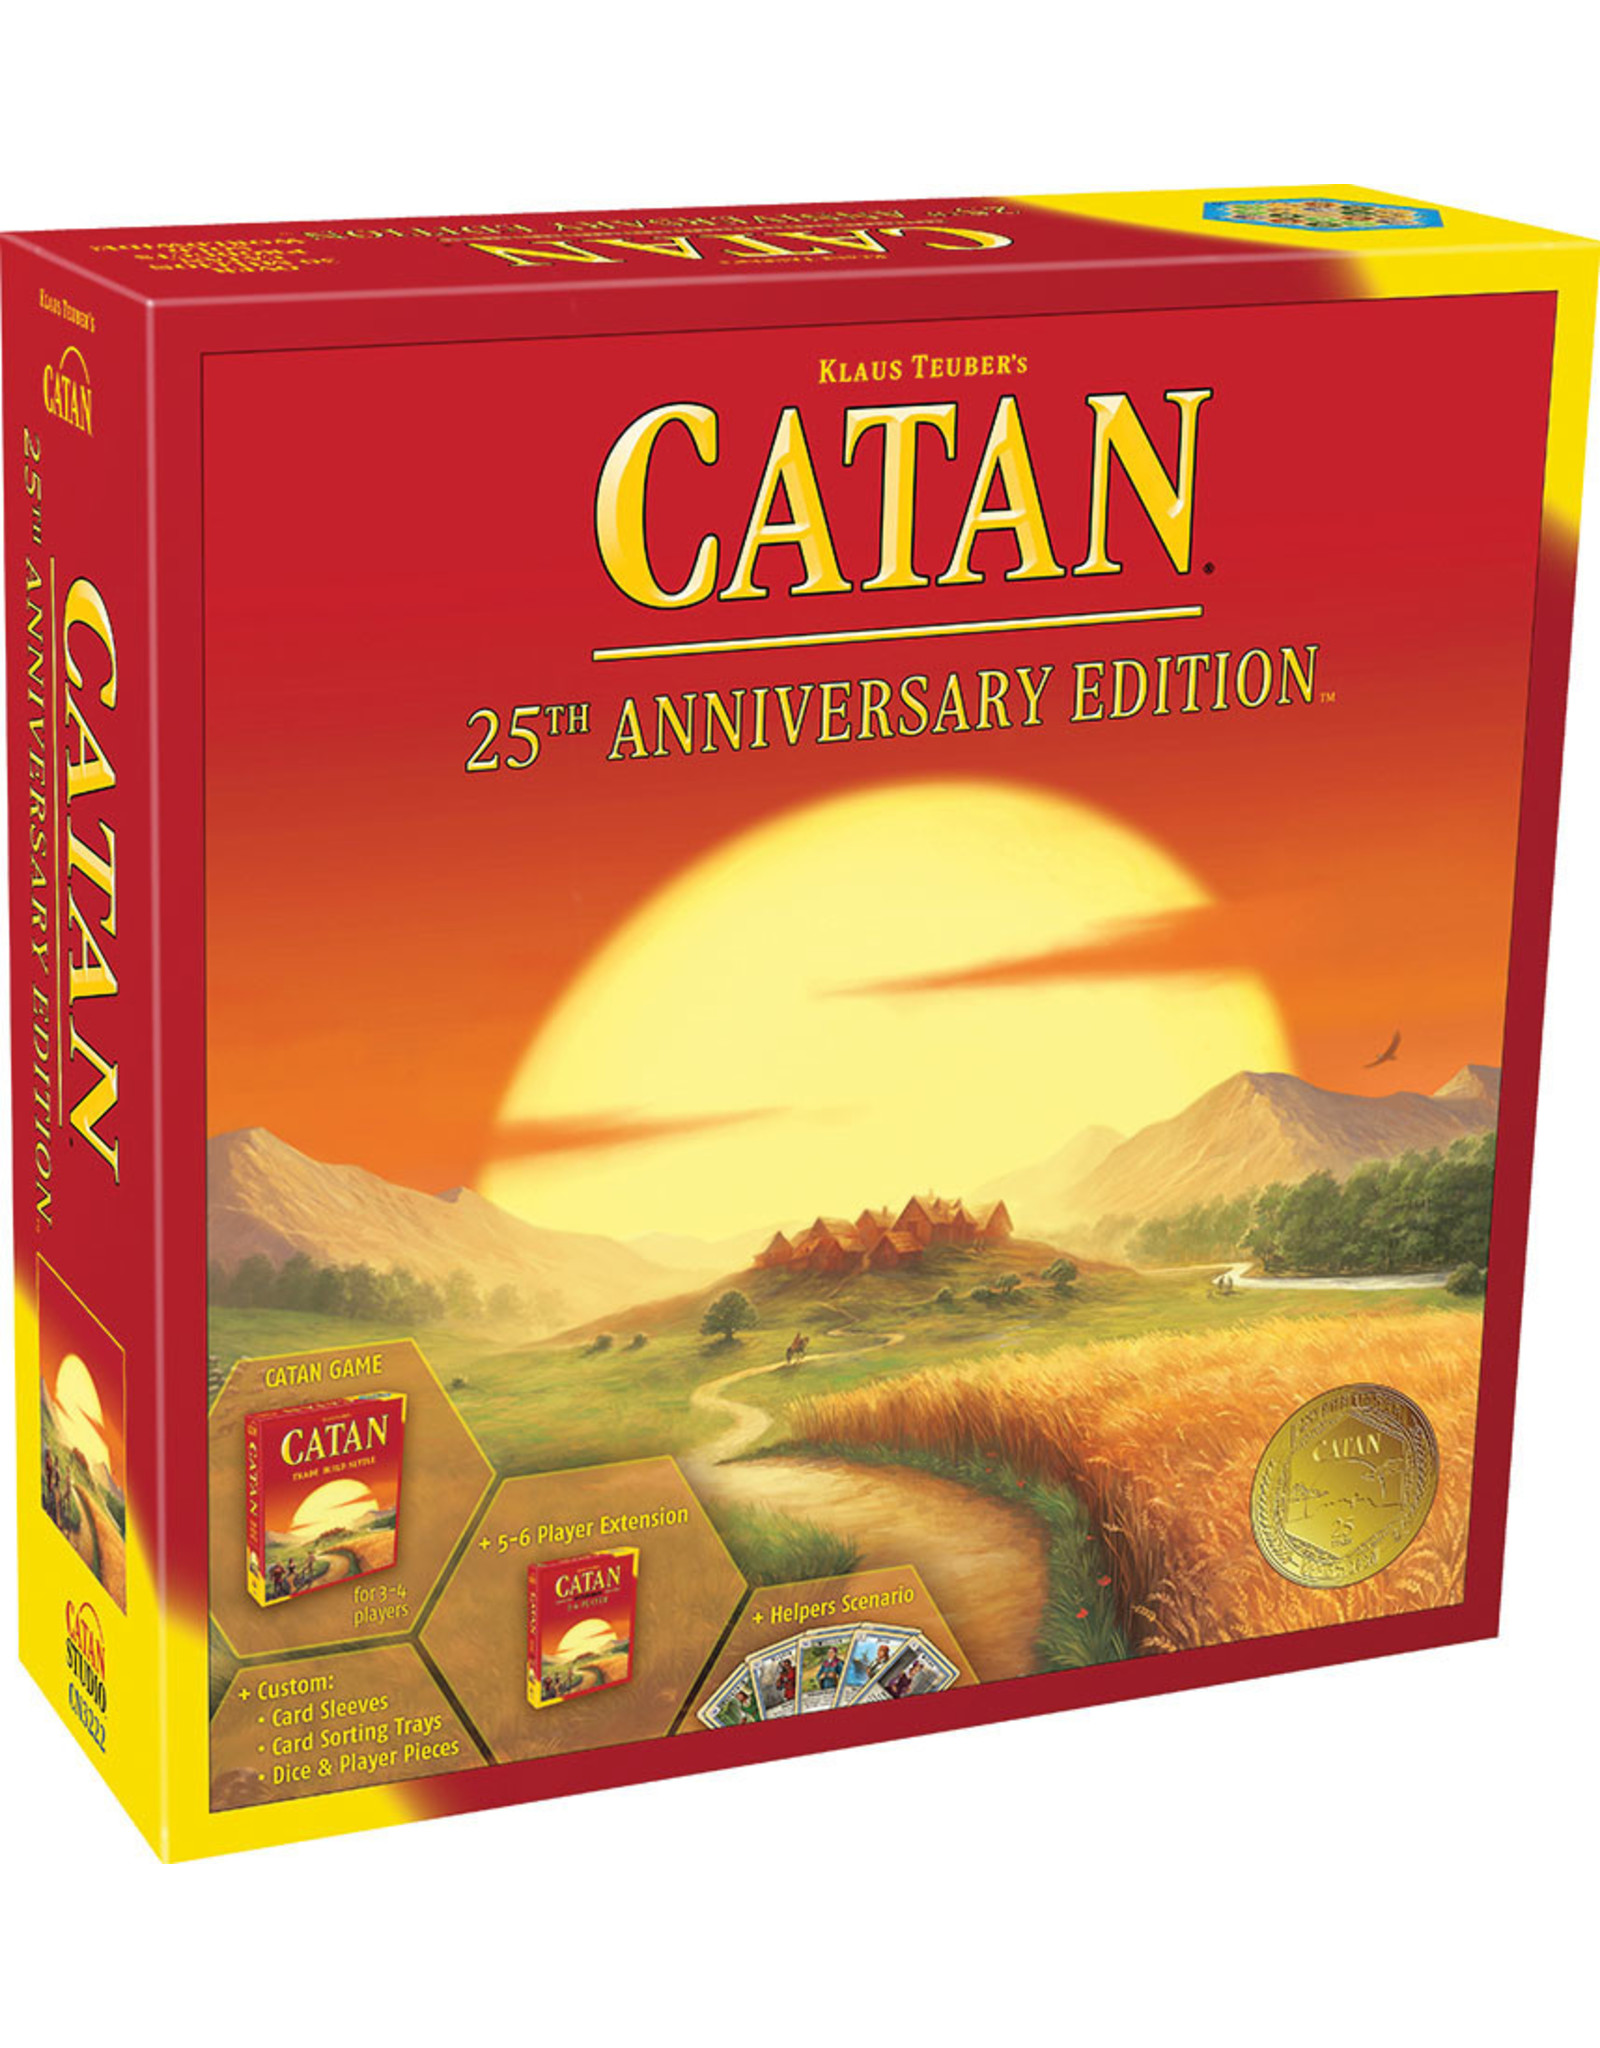 Catan Studios Catan: 25th Anniversary Edition